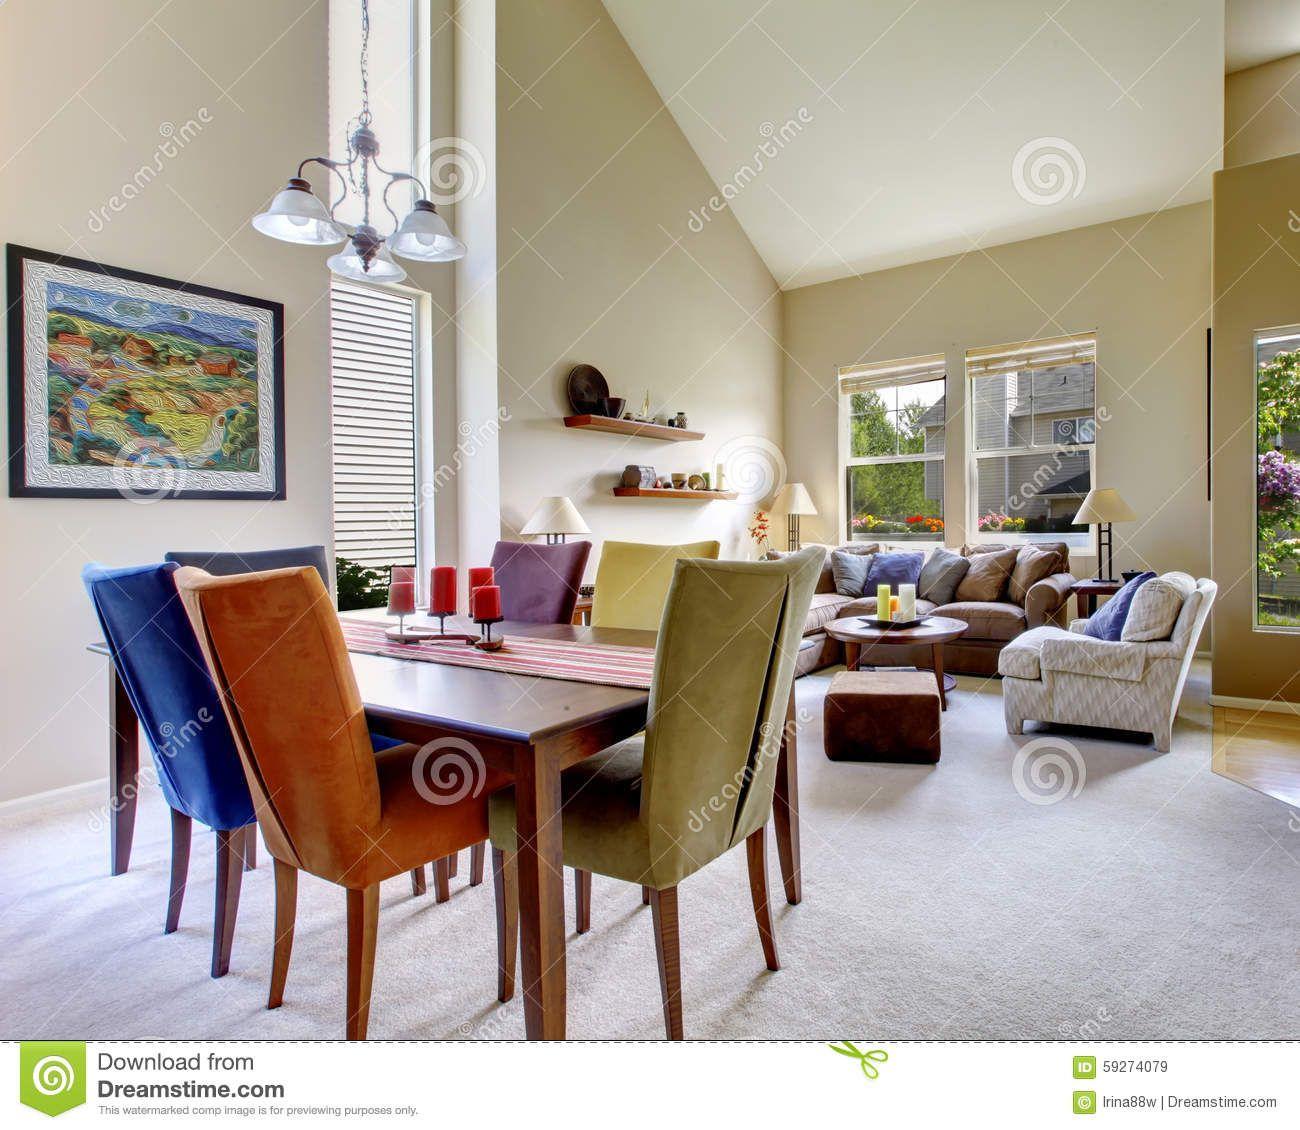 chaises couleurs salle � manger iz66 | jornalagora